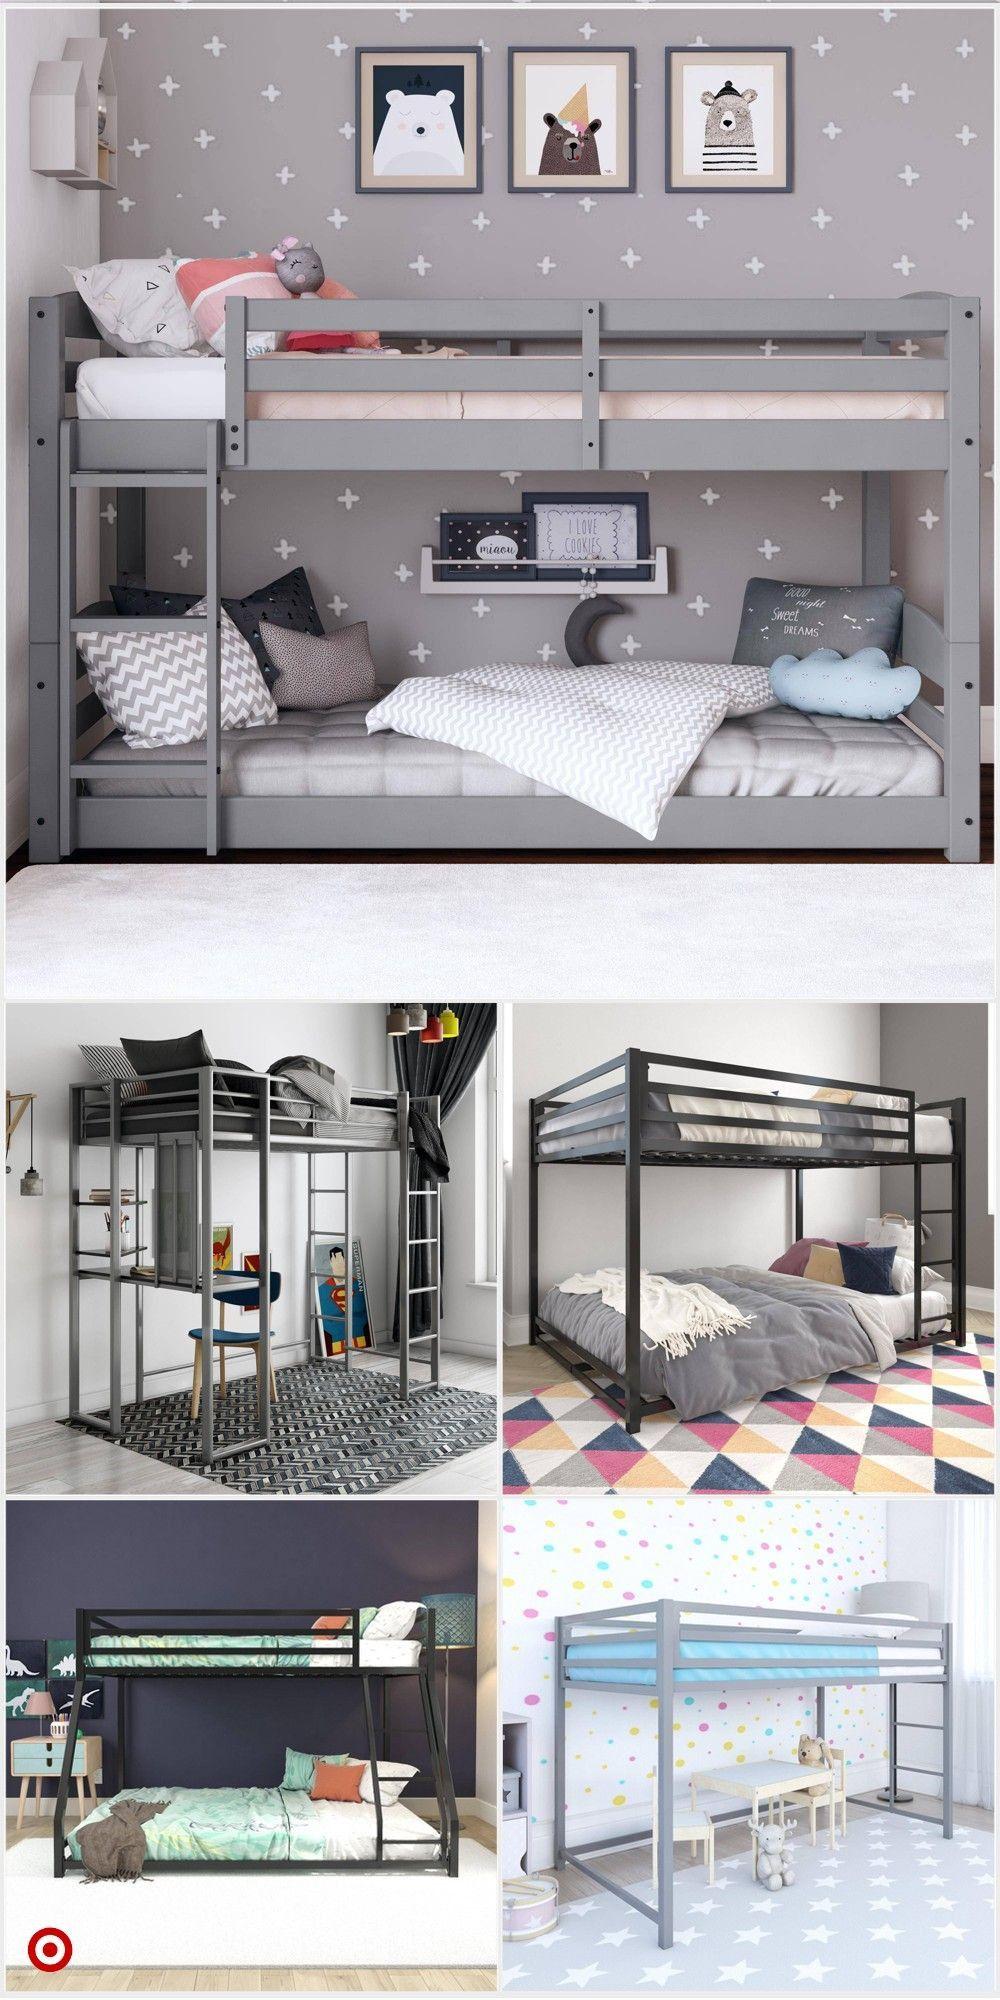 Best Price Bunk Beds Www Naturopathyandyogacouncil Com